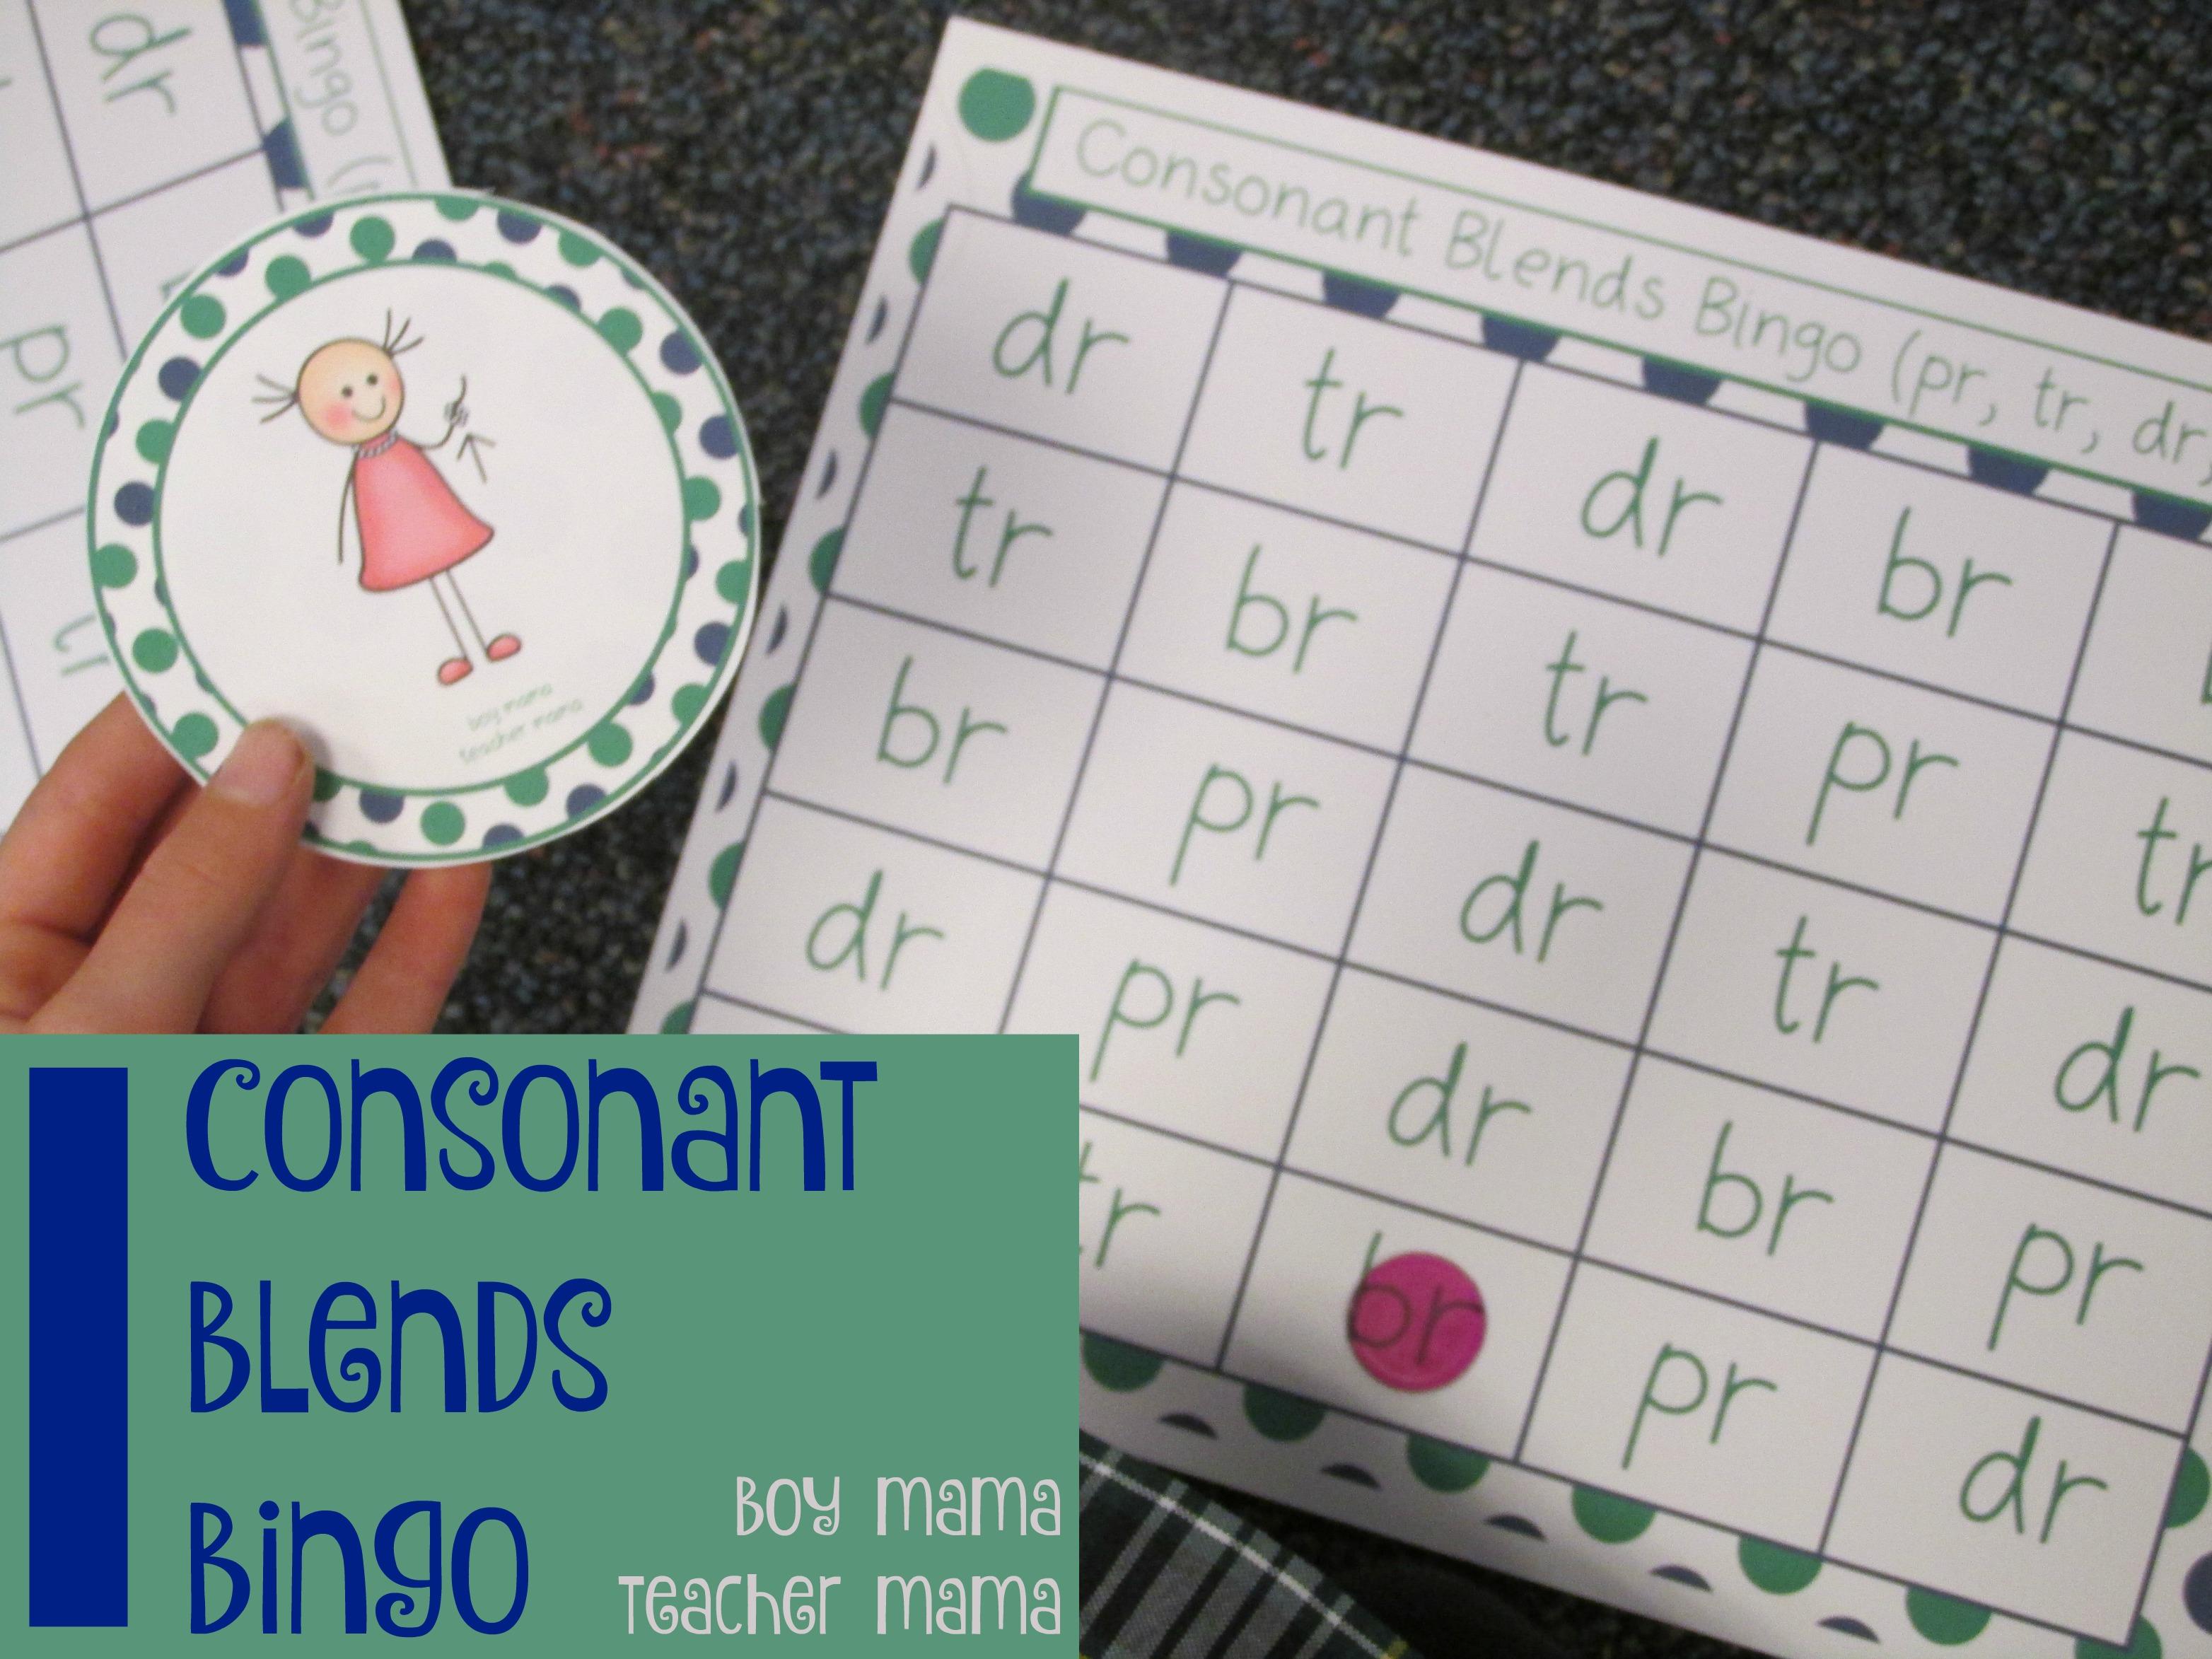 Teacher Mama Consonant Blends Bingo Pr Br Tr Dr